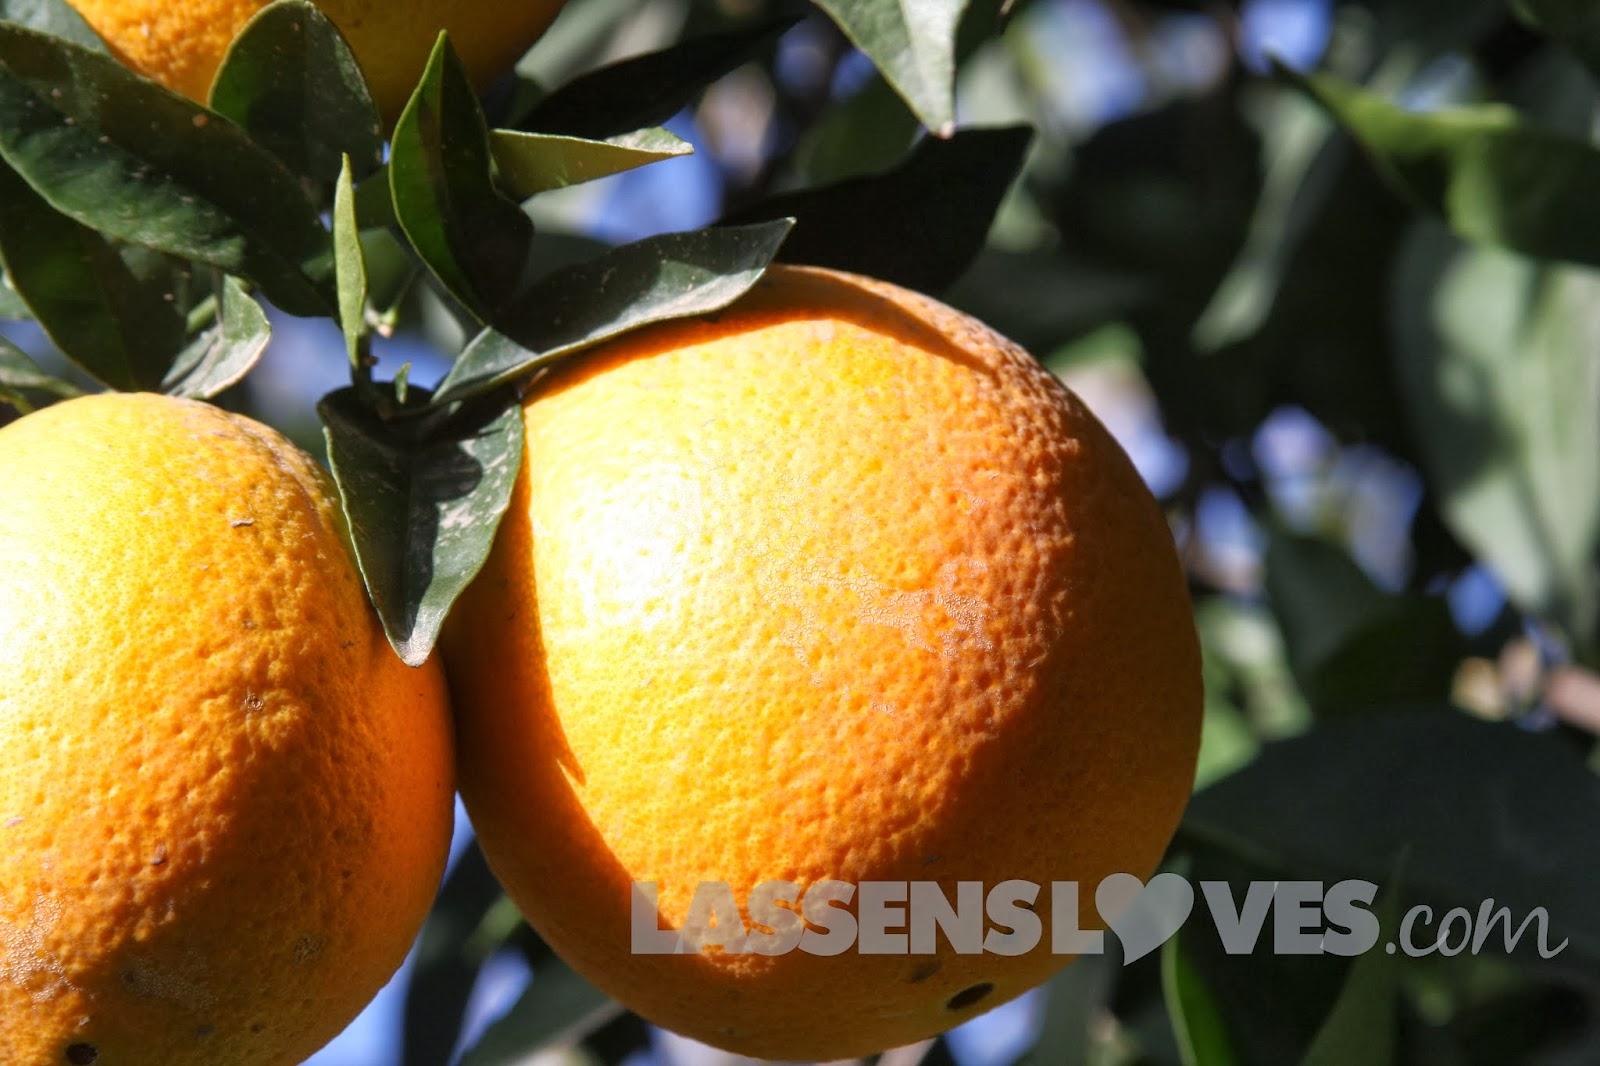 buck+brands+citrus, buck+brands, organic+citrus